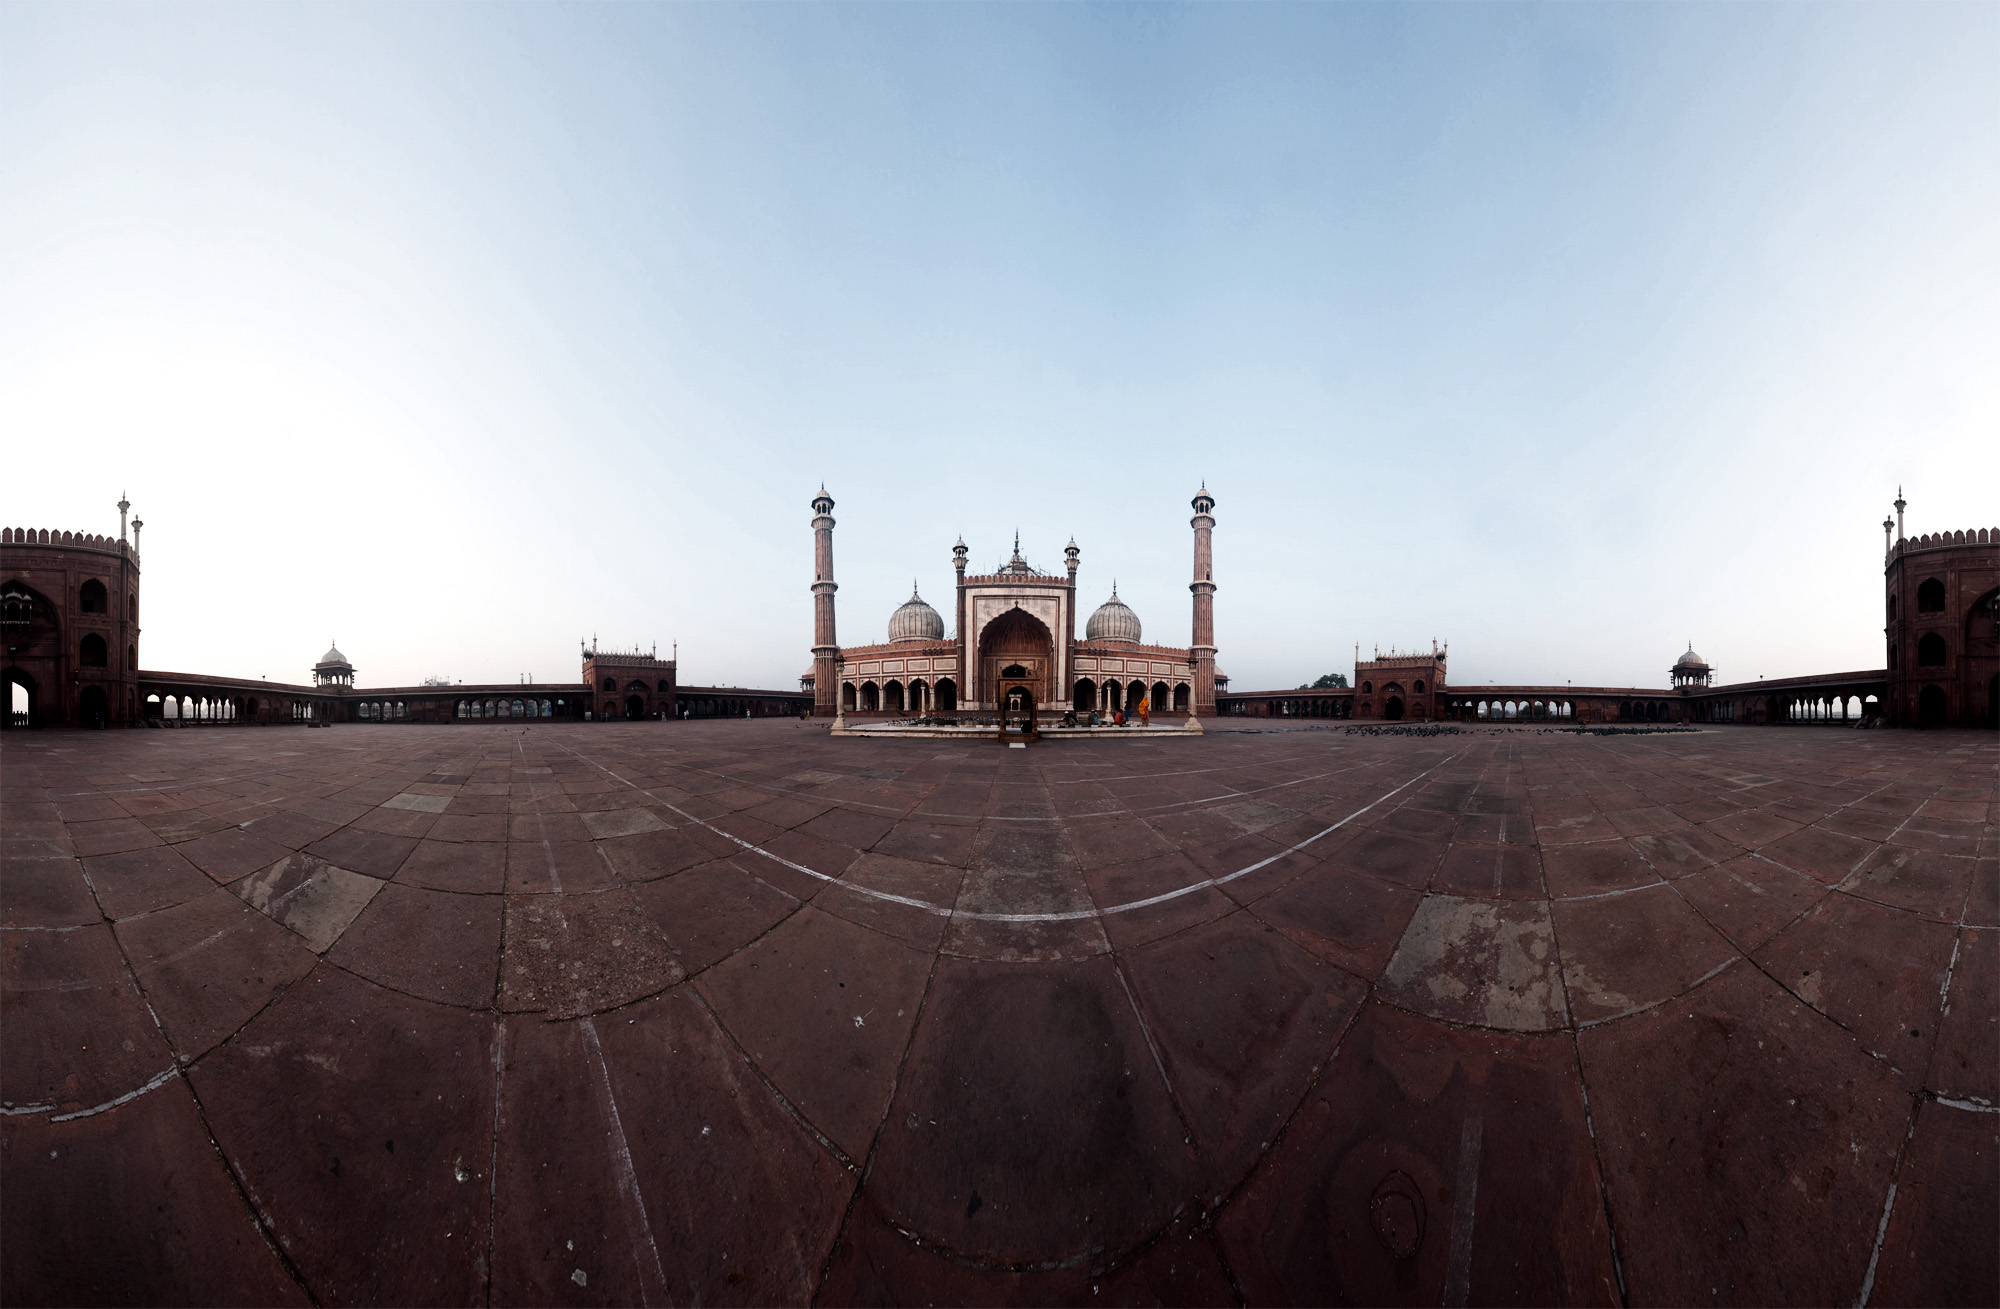 Jama Masjid Panorama Composite Photo - Delhi, India - Daily Travel Photos